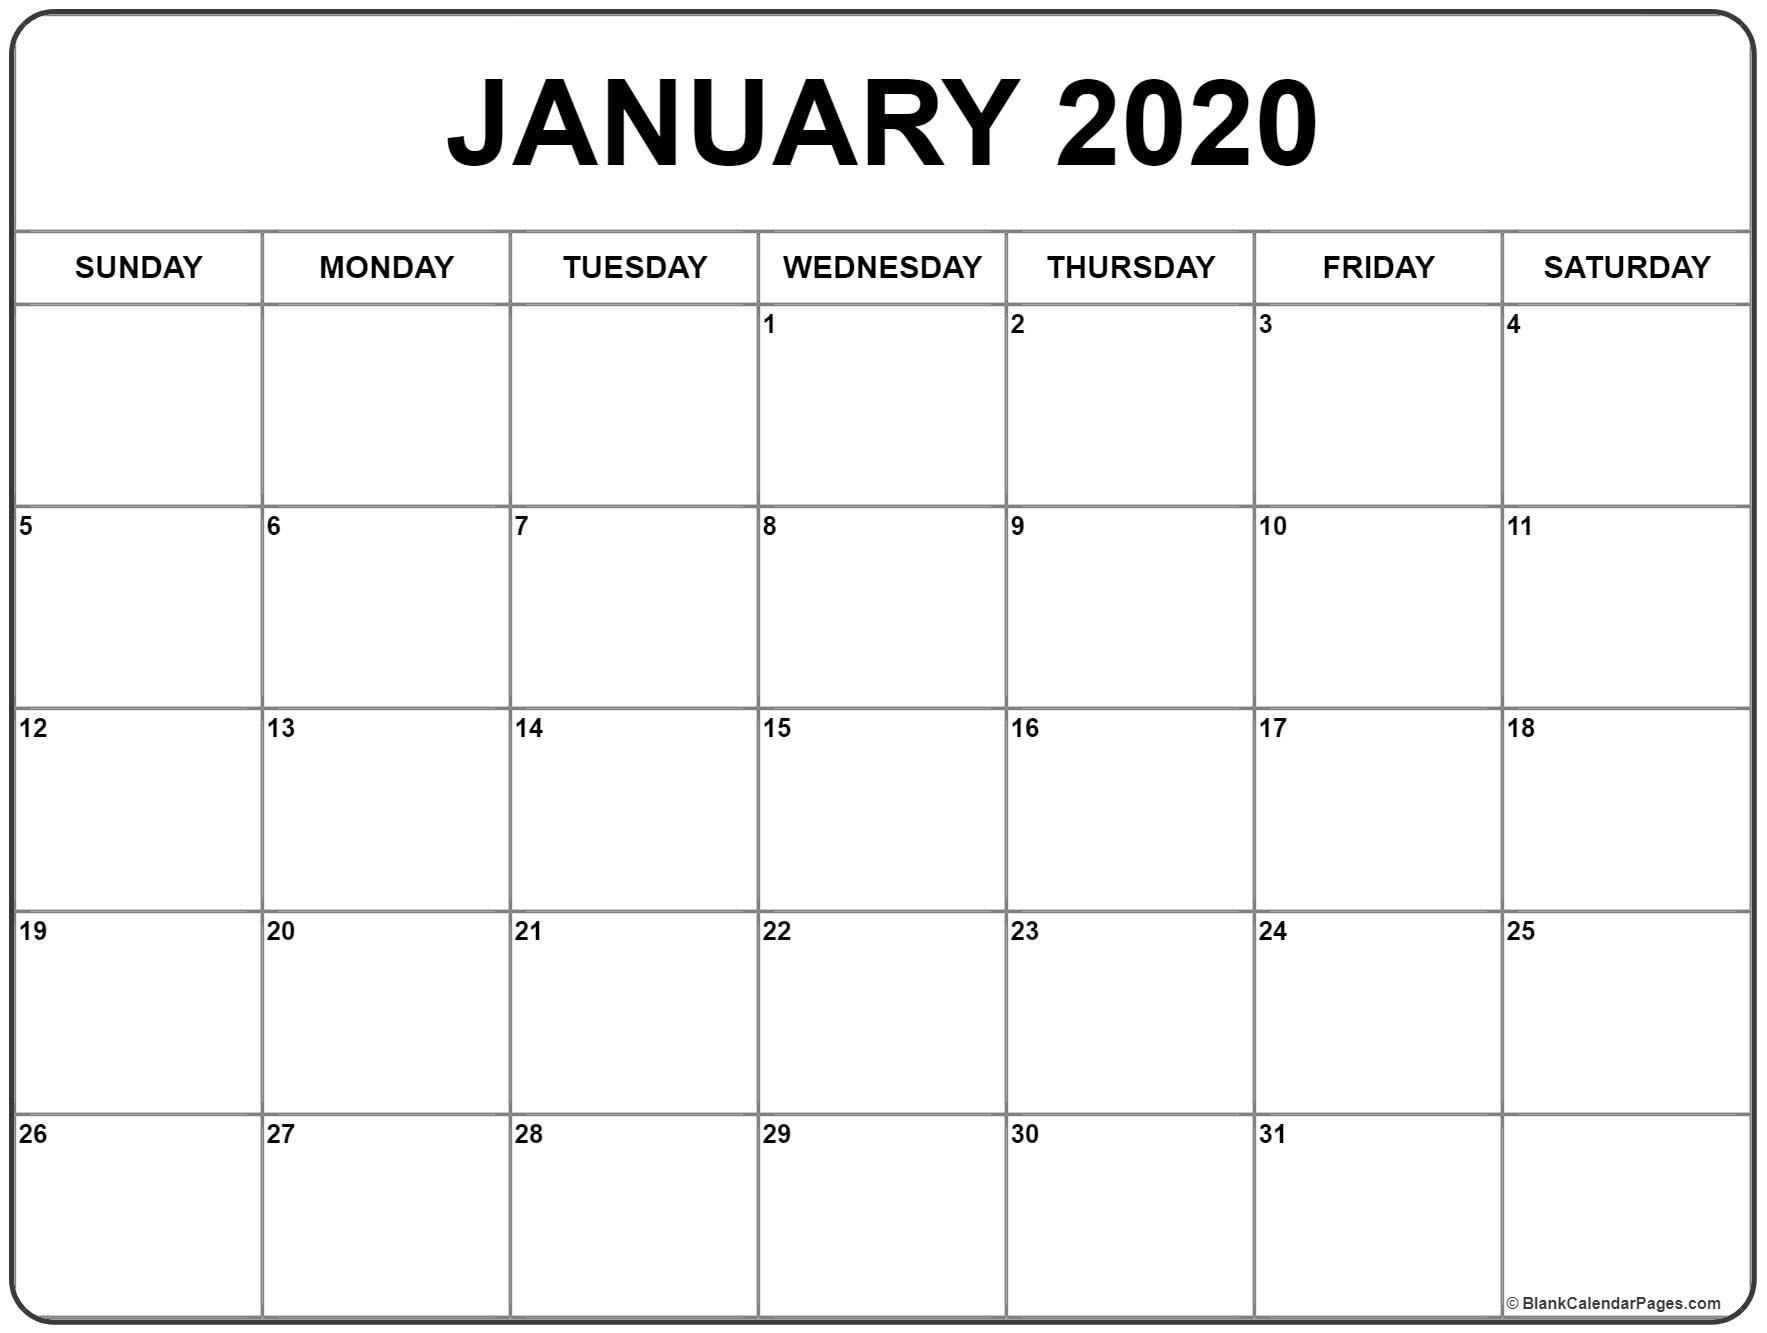 January 2020 Calendar | Free Printable Monthly Calendars with regard to Free Printable Weekly Calendar 2020